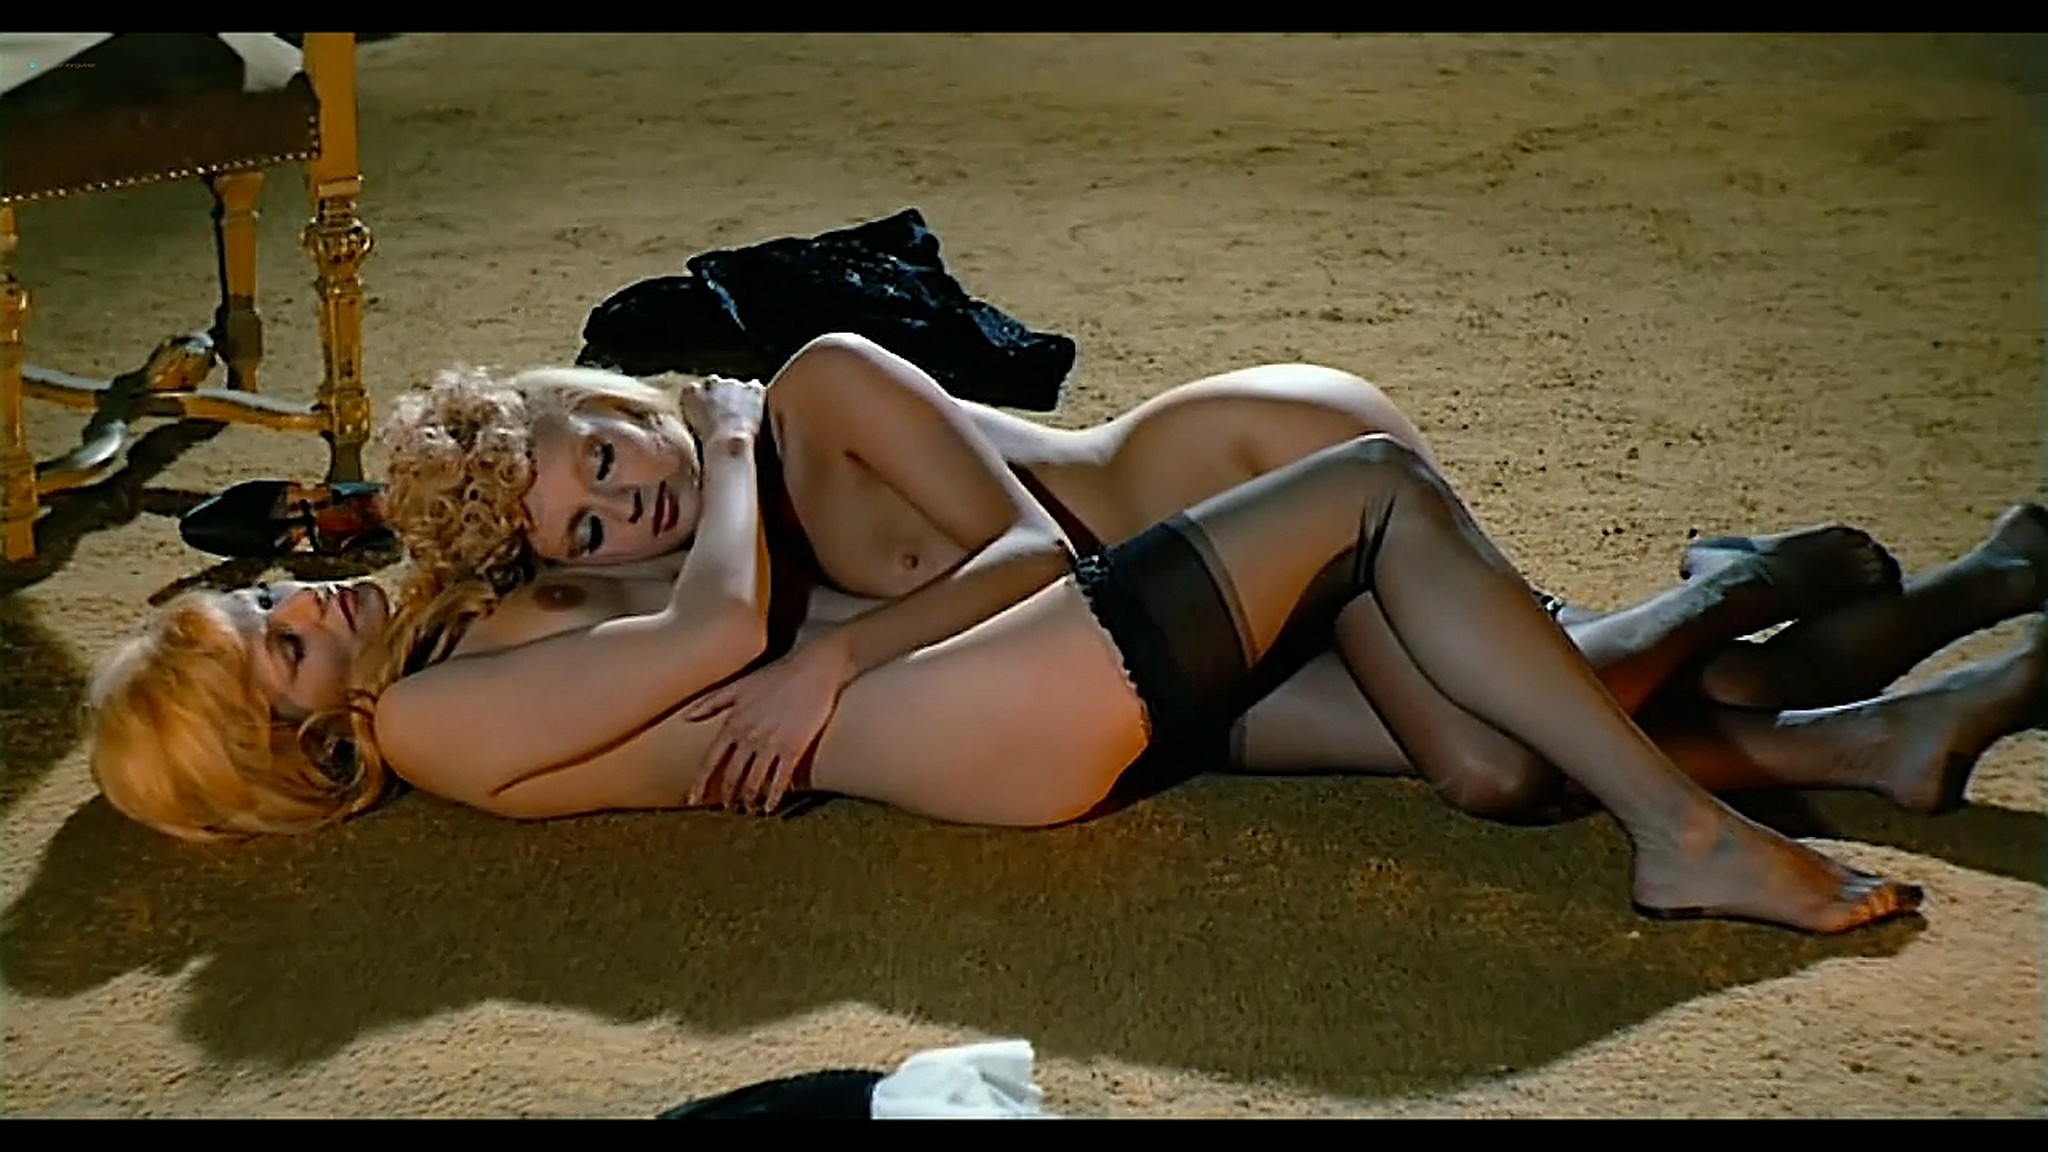 Joey Heatherton nude topless Sybil Danning Karin Schubert and others nude Bluebeard 1972 720p 06